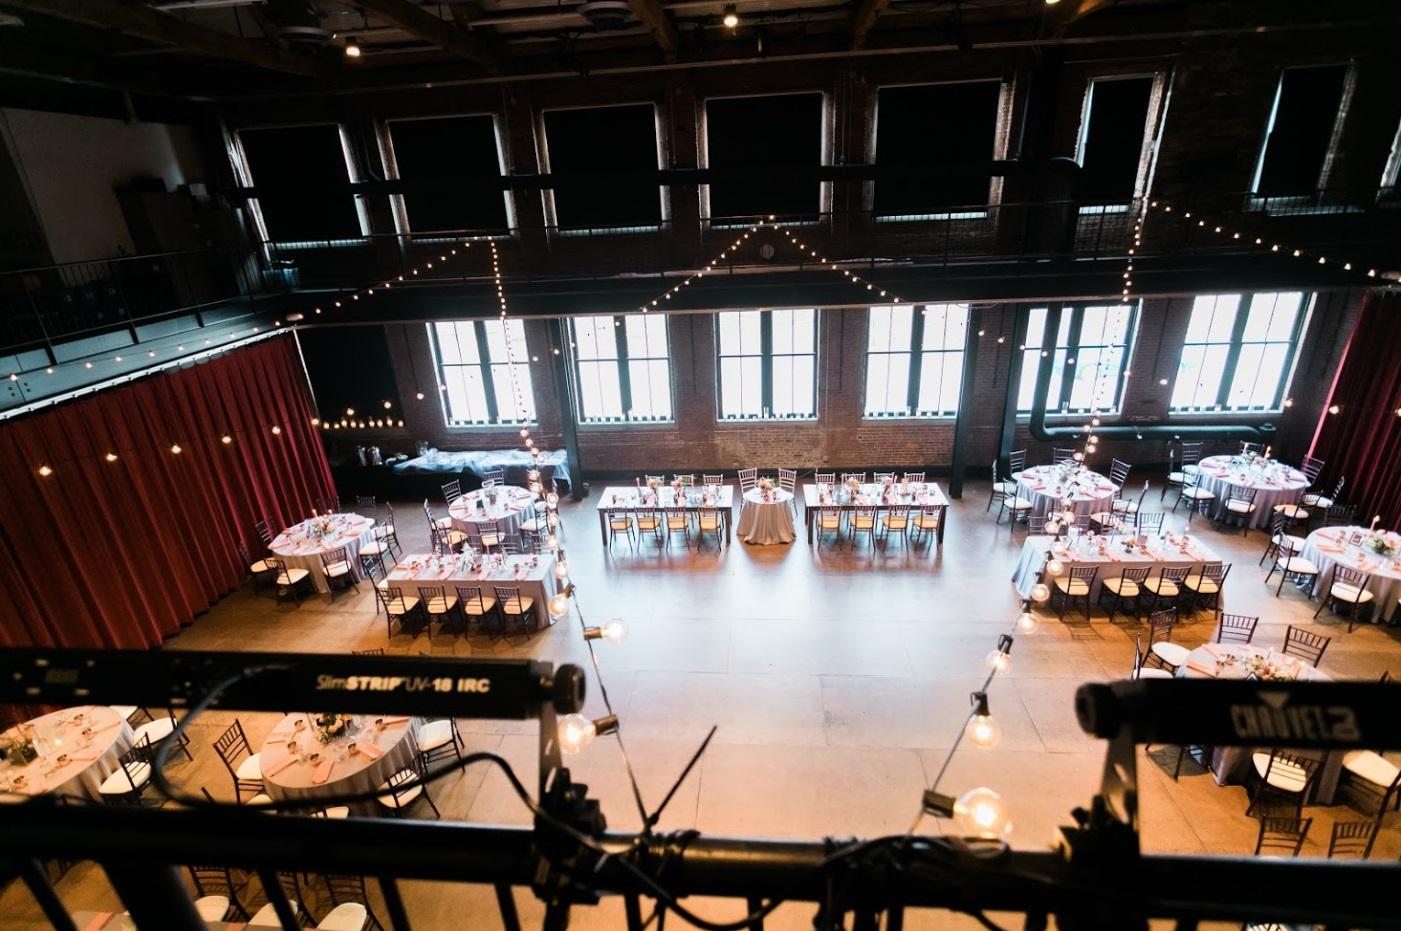 Pittsburgh Opera House_Nicole Englert58.jpg